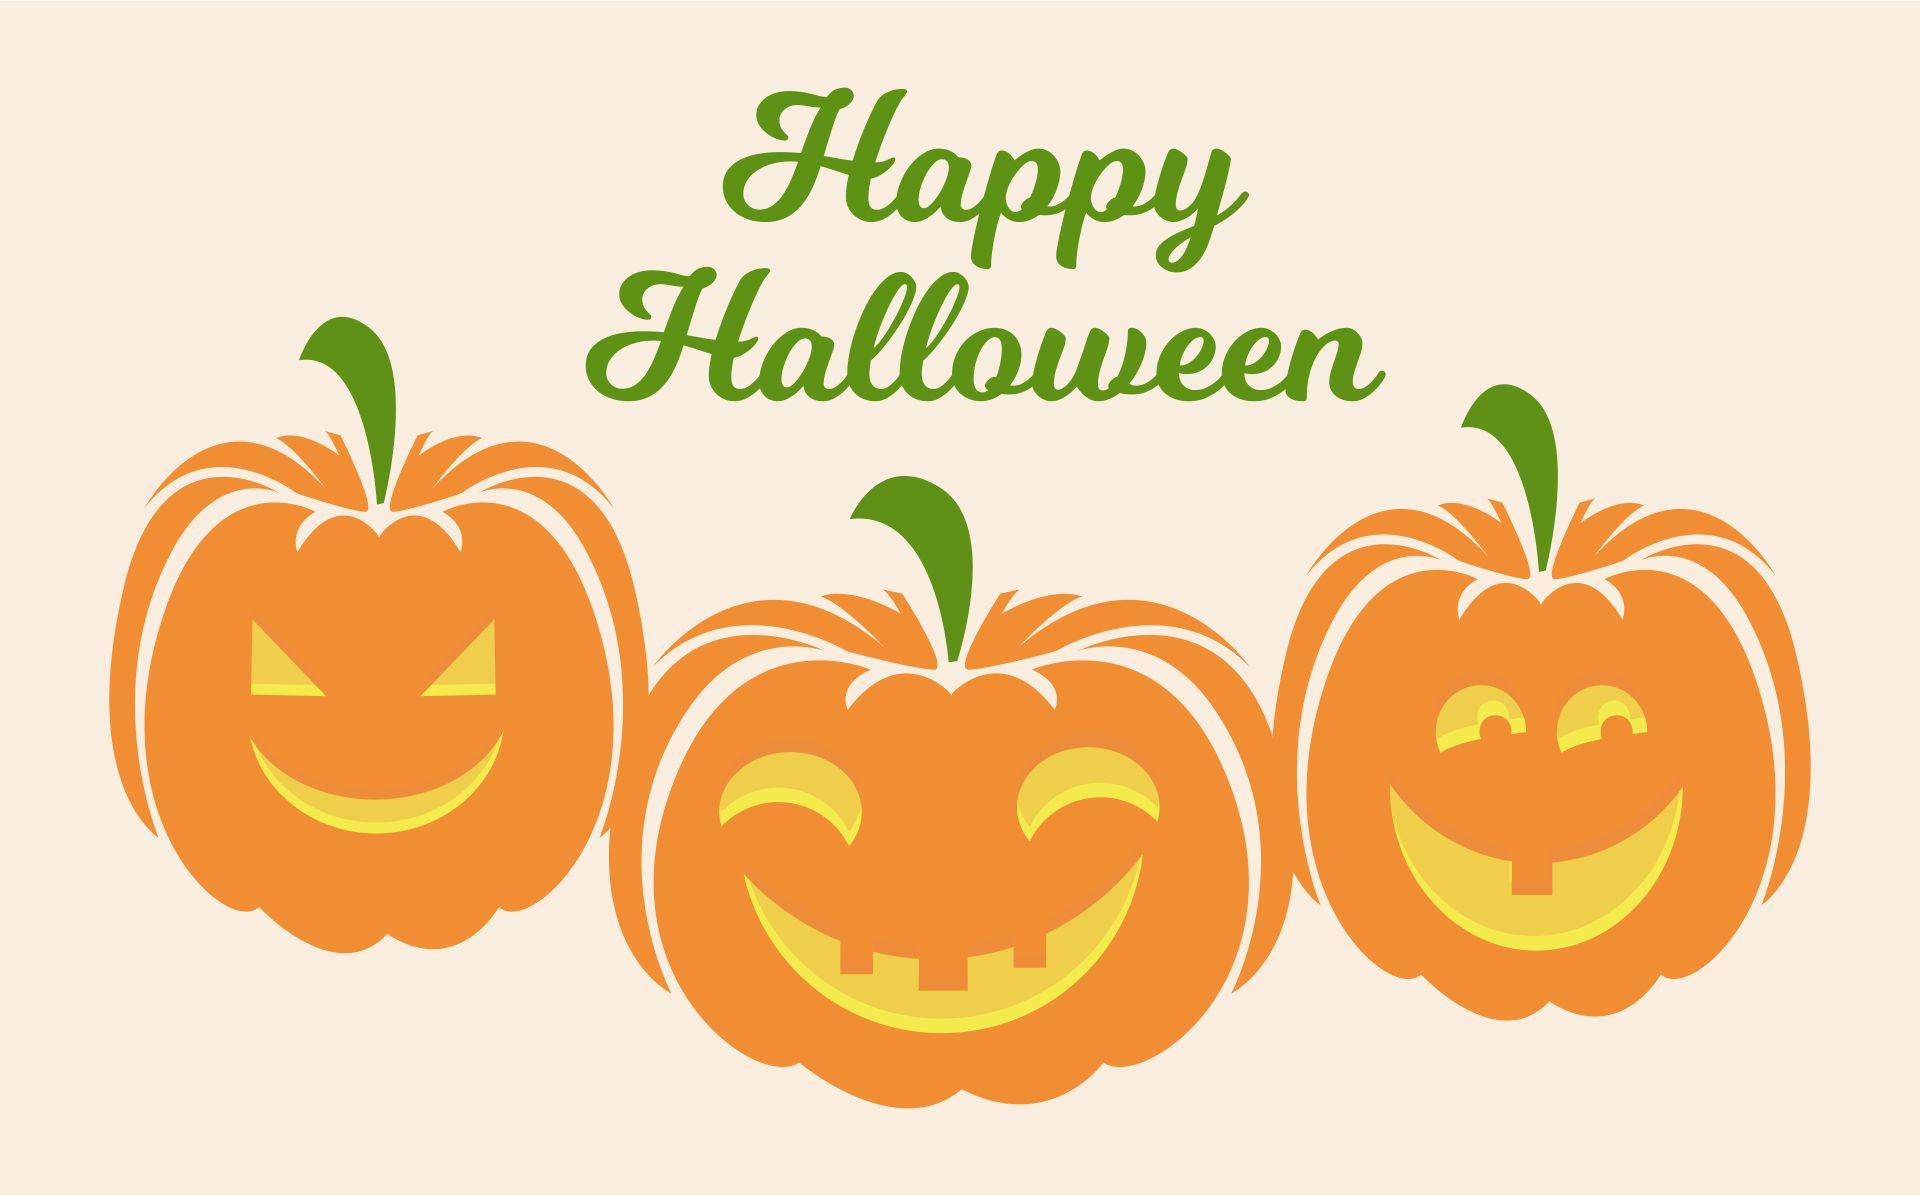 Vintage Printable Halloween Pumpkin Art